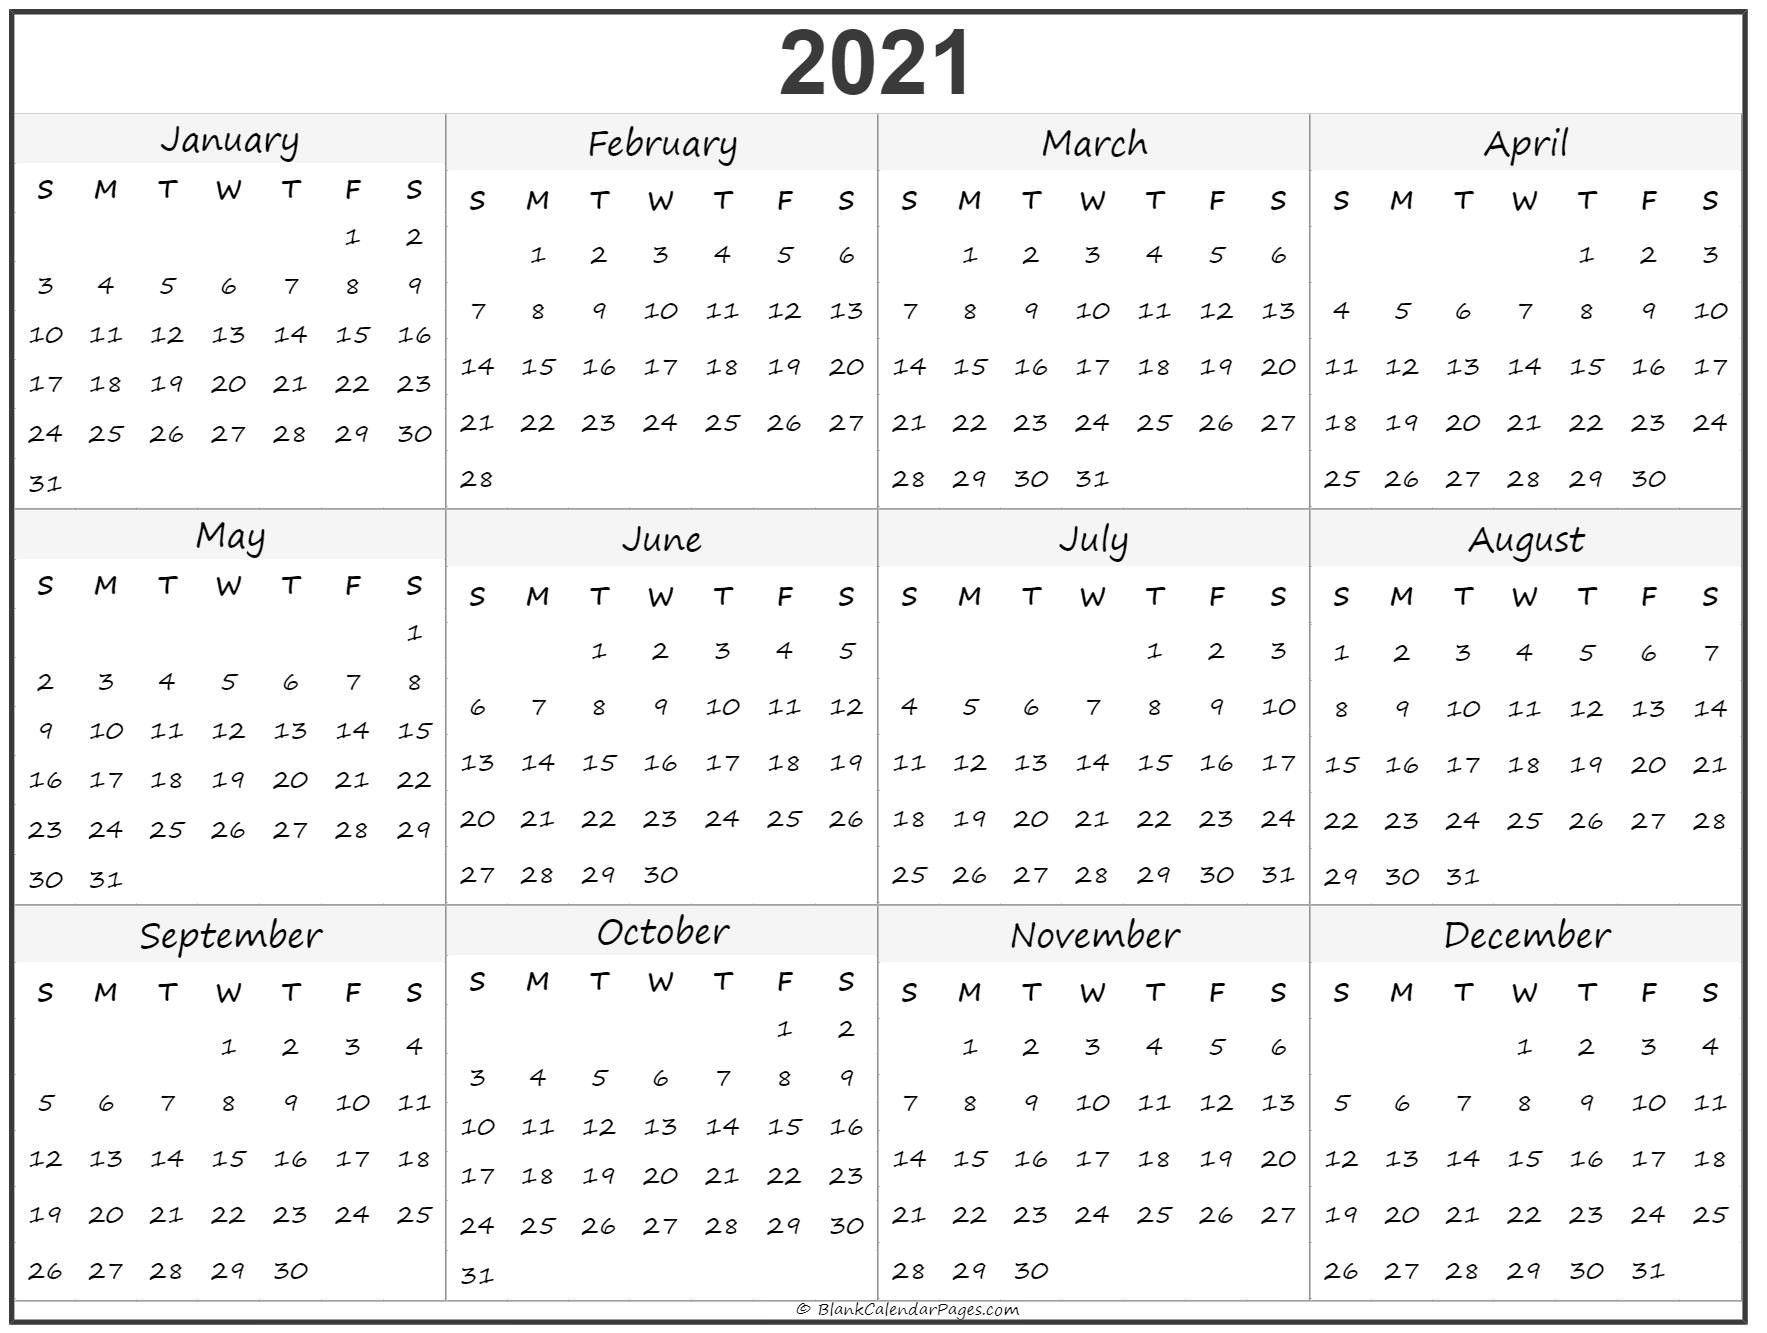 2021 calendar printable one page | free printable calendar